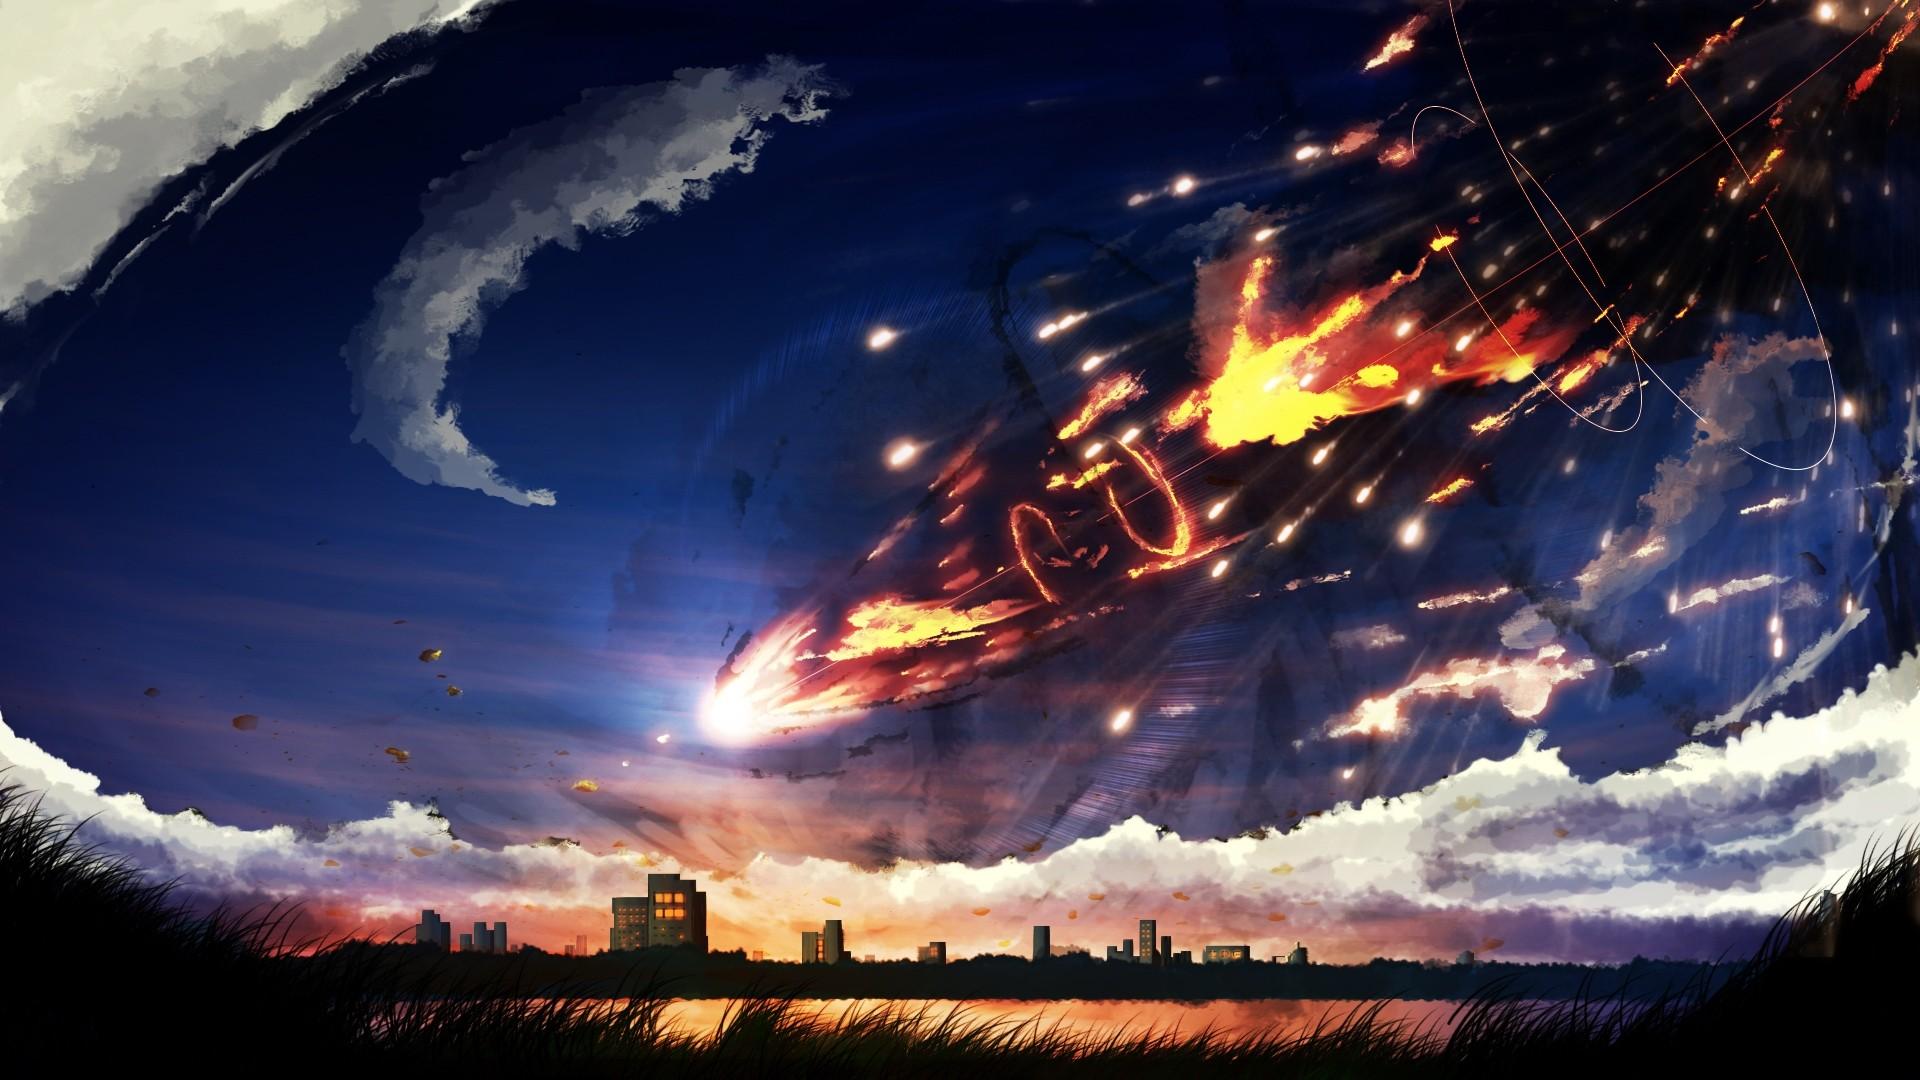 Anime Cloud hd wallpaper 1080